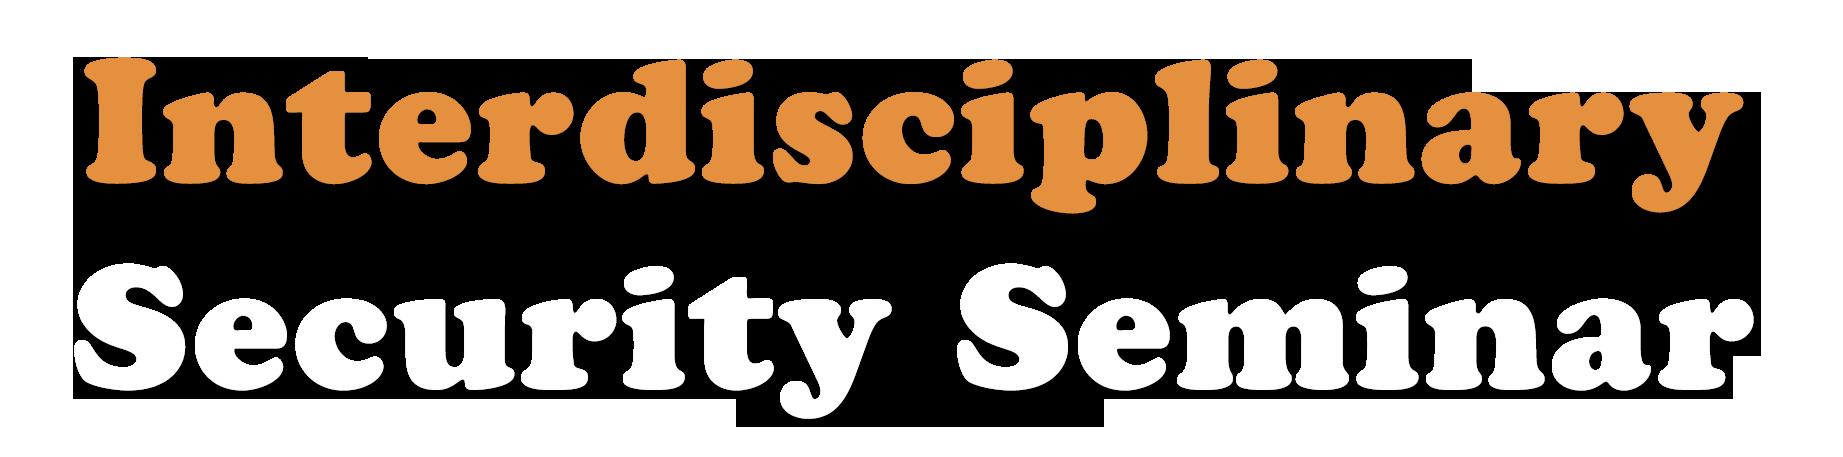 Interdisciplinary Security Seminar